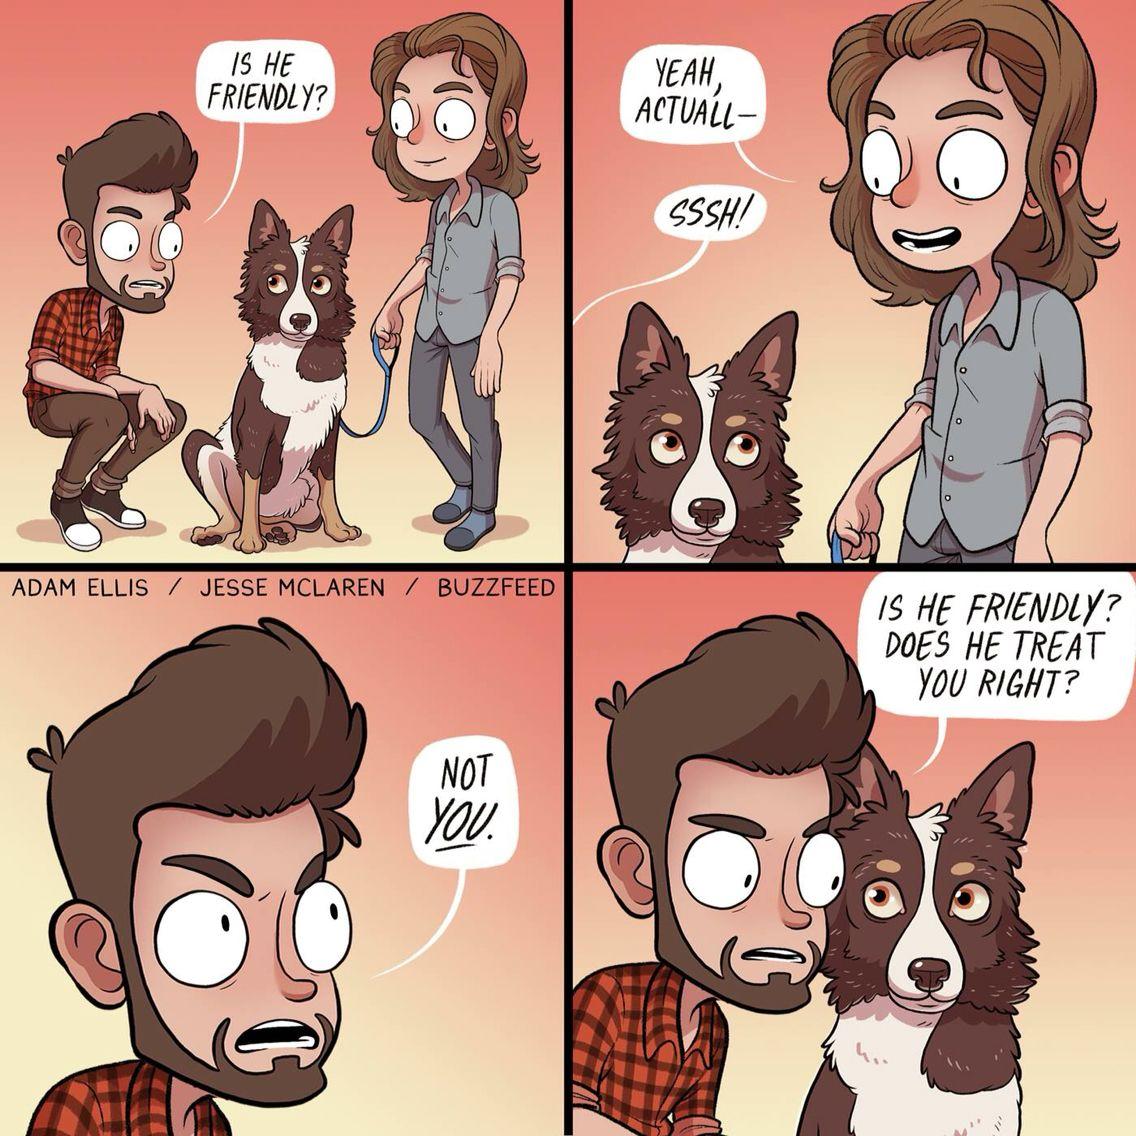 Adam Ellis-------basically me when I see a dog